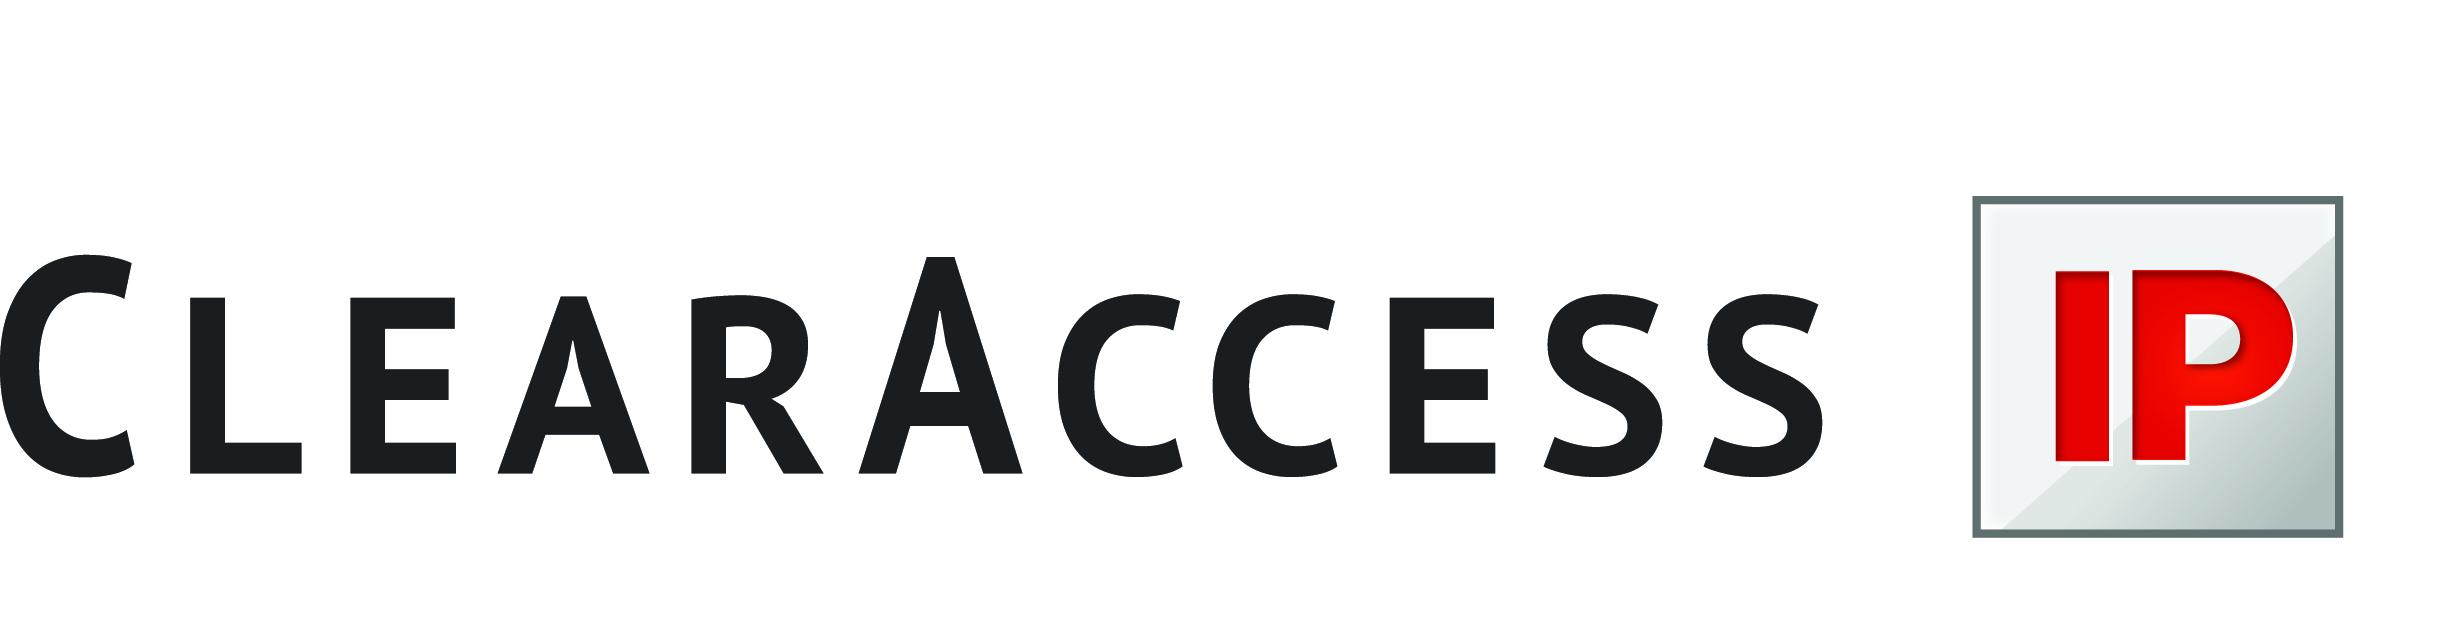 ClearAccessIP - IPBC Global 2019